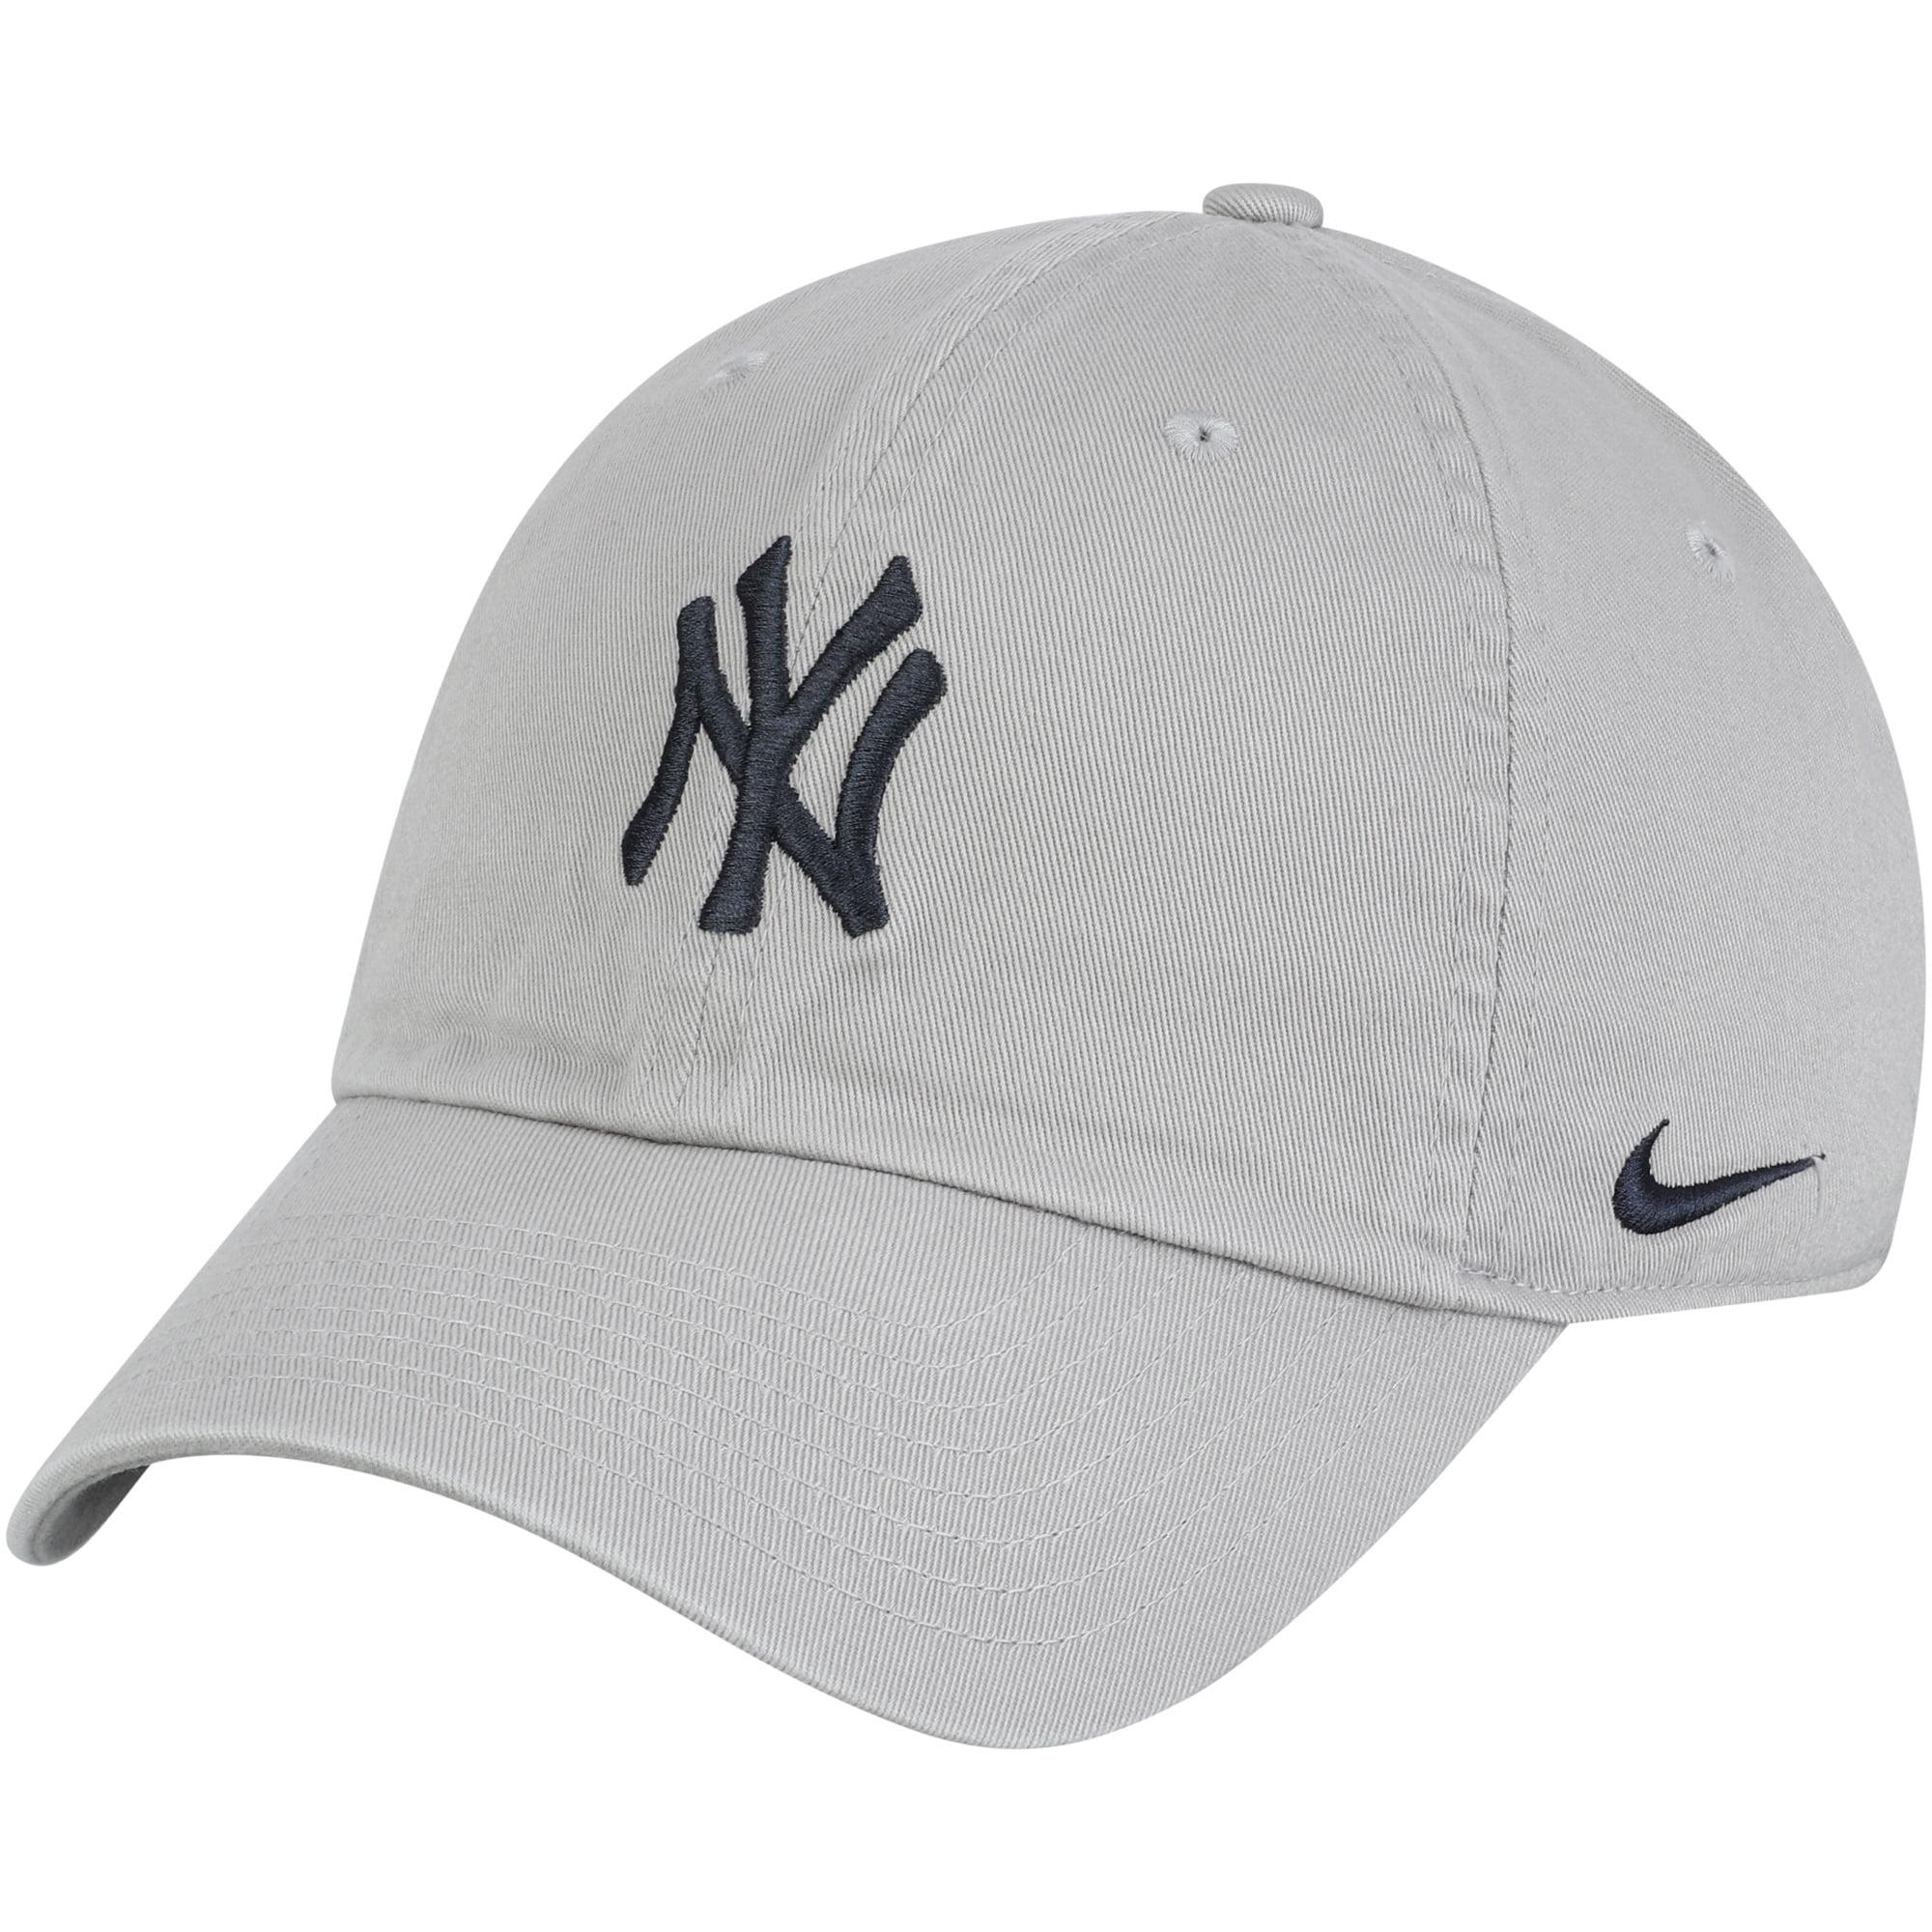 dcb8d355a65 New York Yankees Nike MLB Heritage 86 Adjustable Hat - Gray - OSFA -  Walmart.com